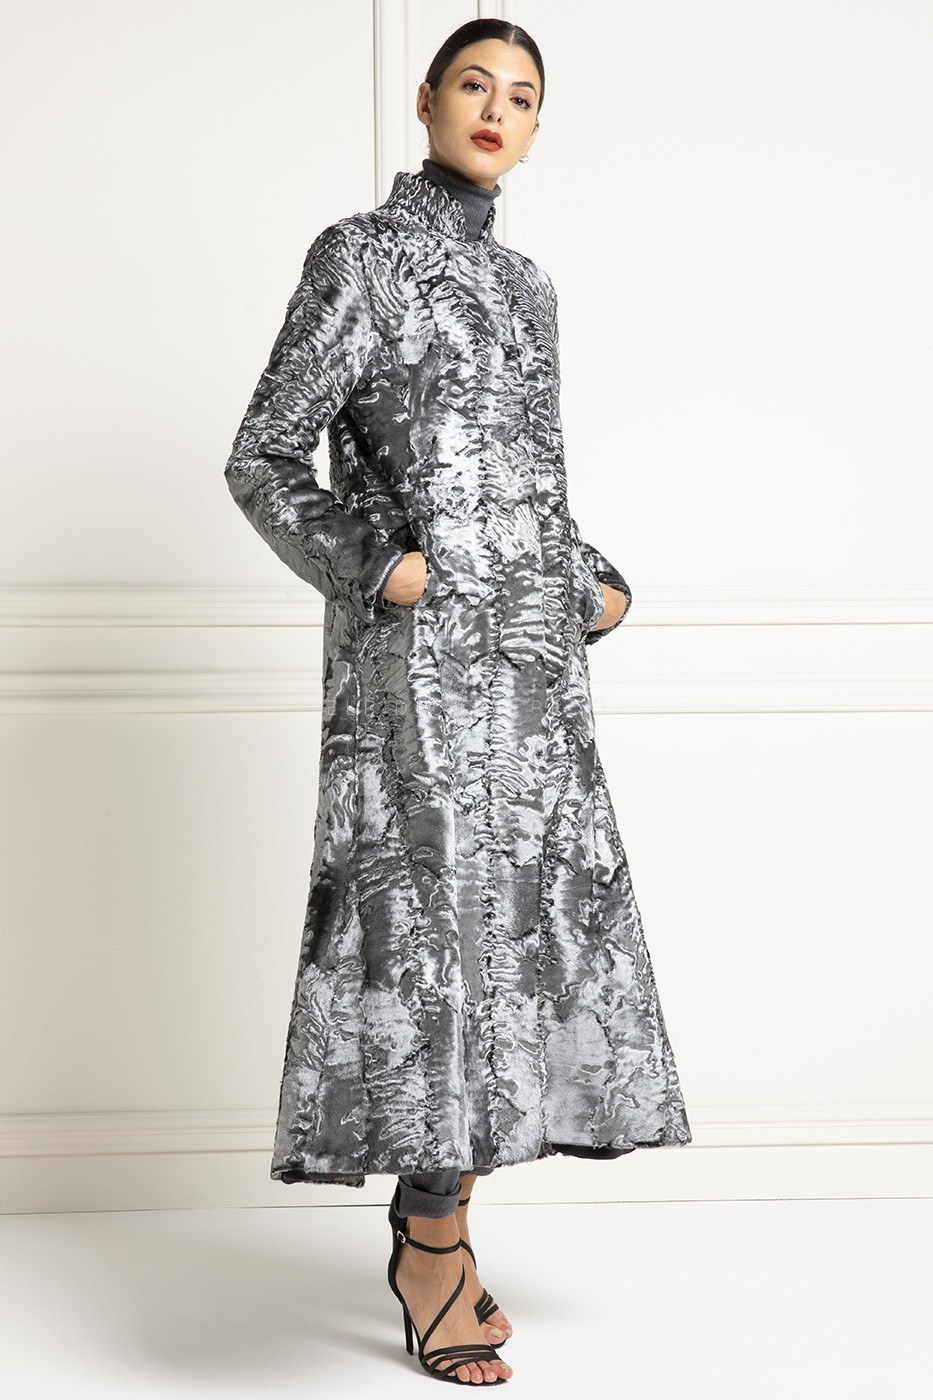 Silver Swakara Coat - Length 130 cm